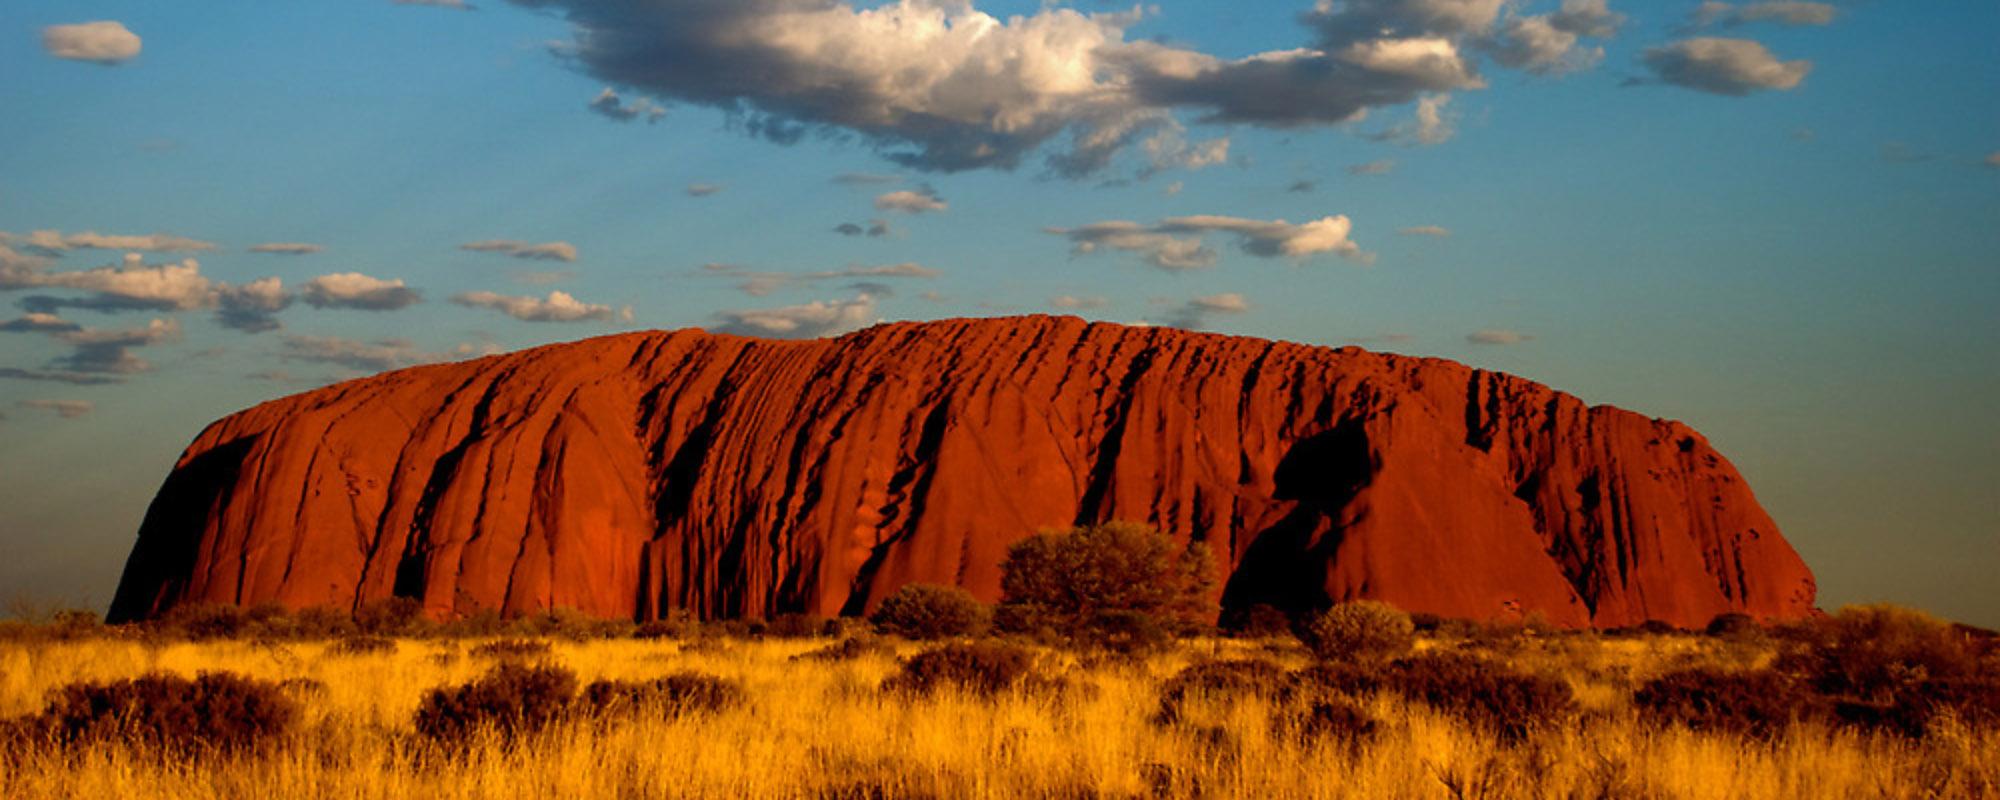 Ayers Rock - Uluru - Outback air safaris with Sky Dance. Uluru air adventure